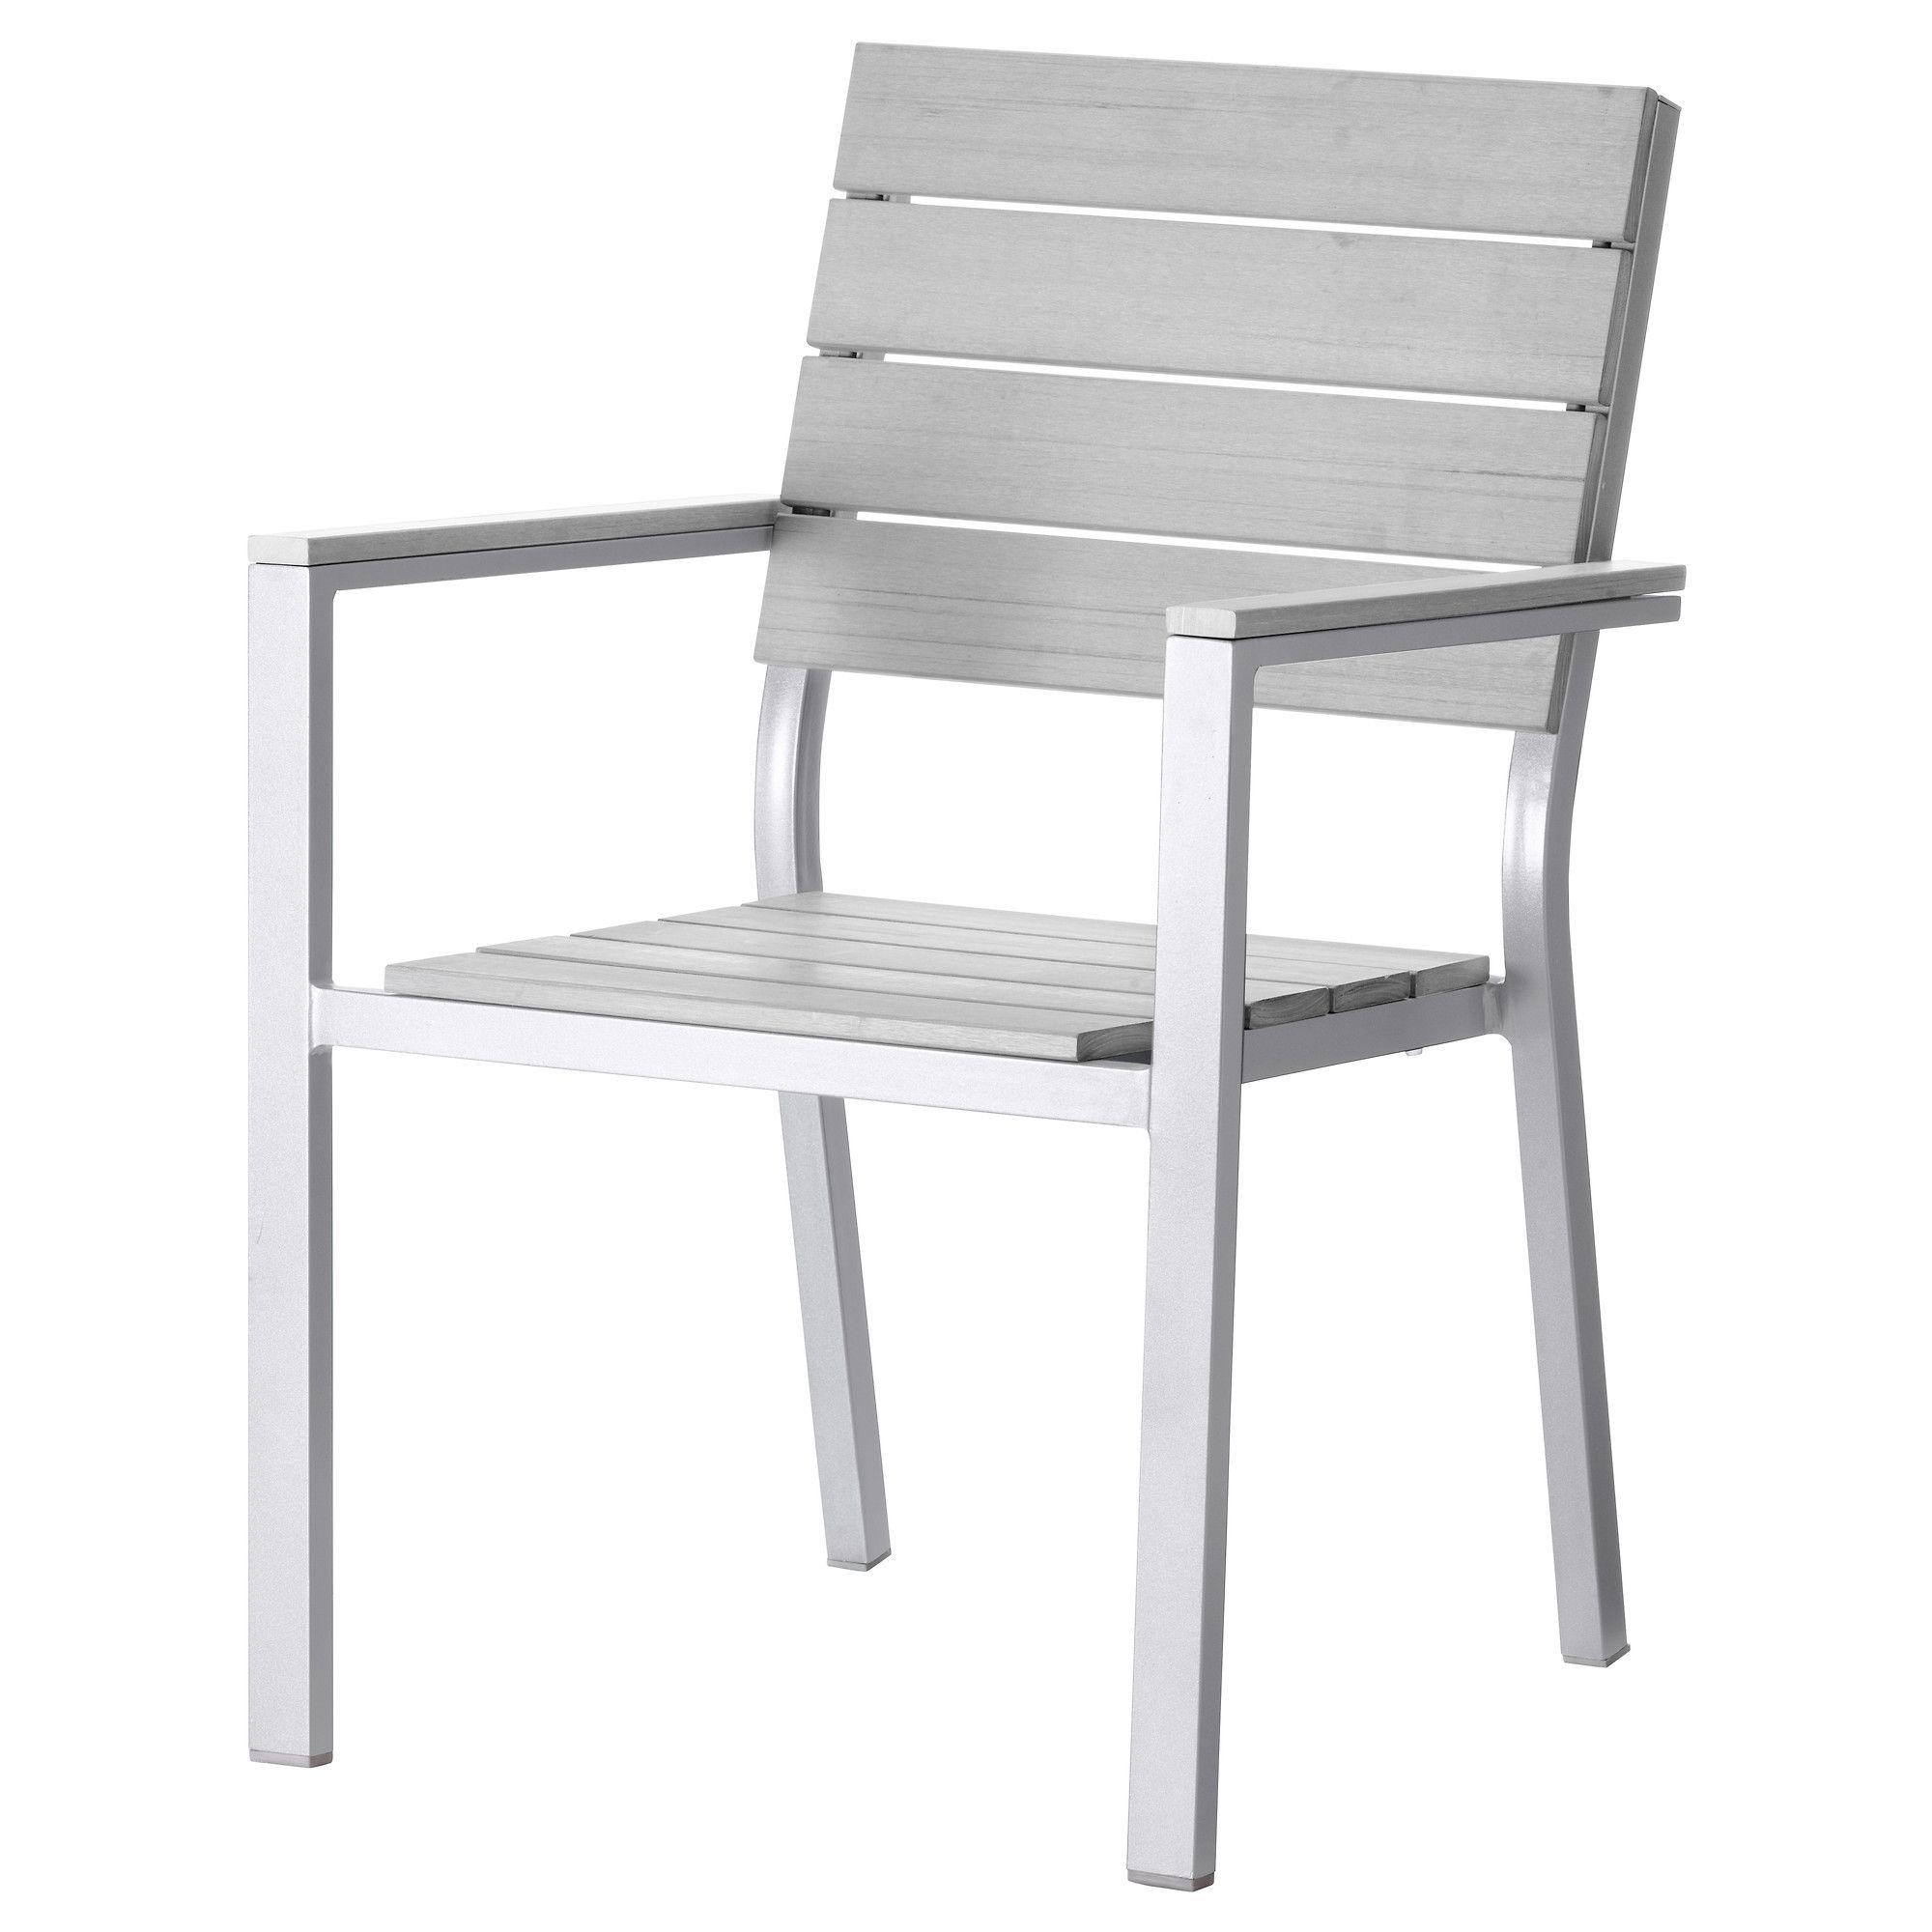 Ikea Gartenstuhl falster armlehnstuhl außen grau jetzt bestellen unter https